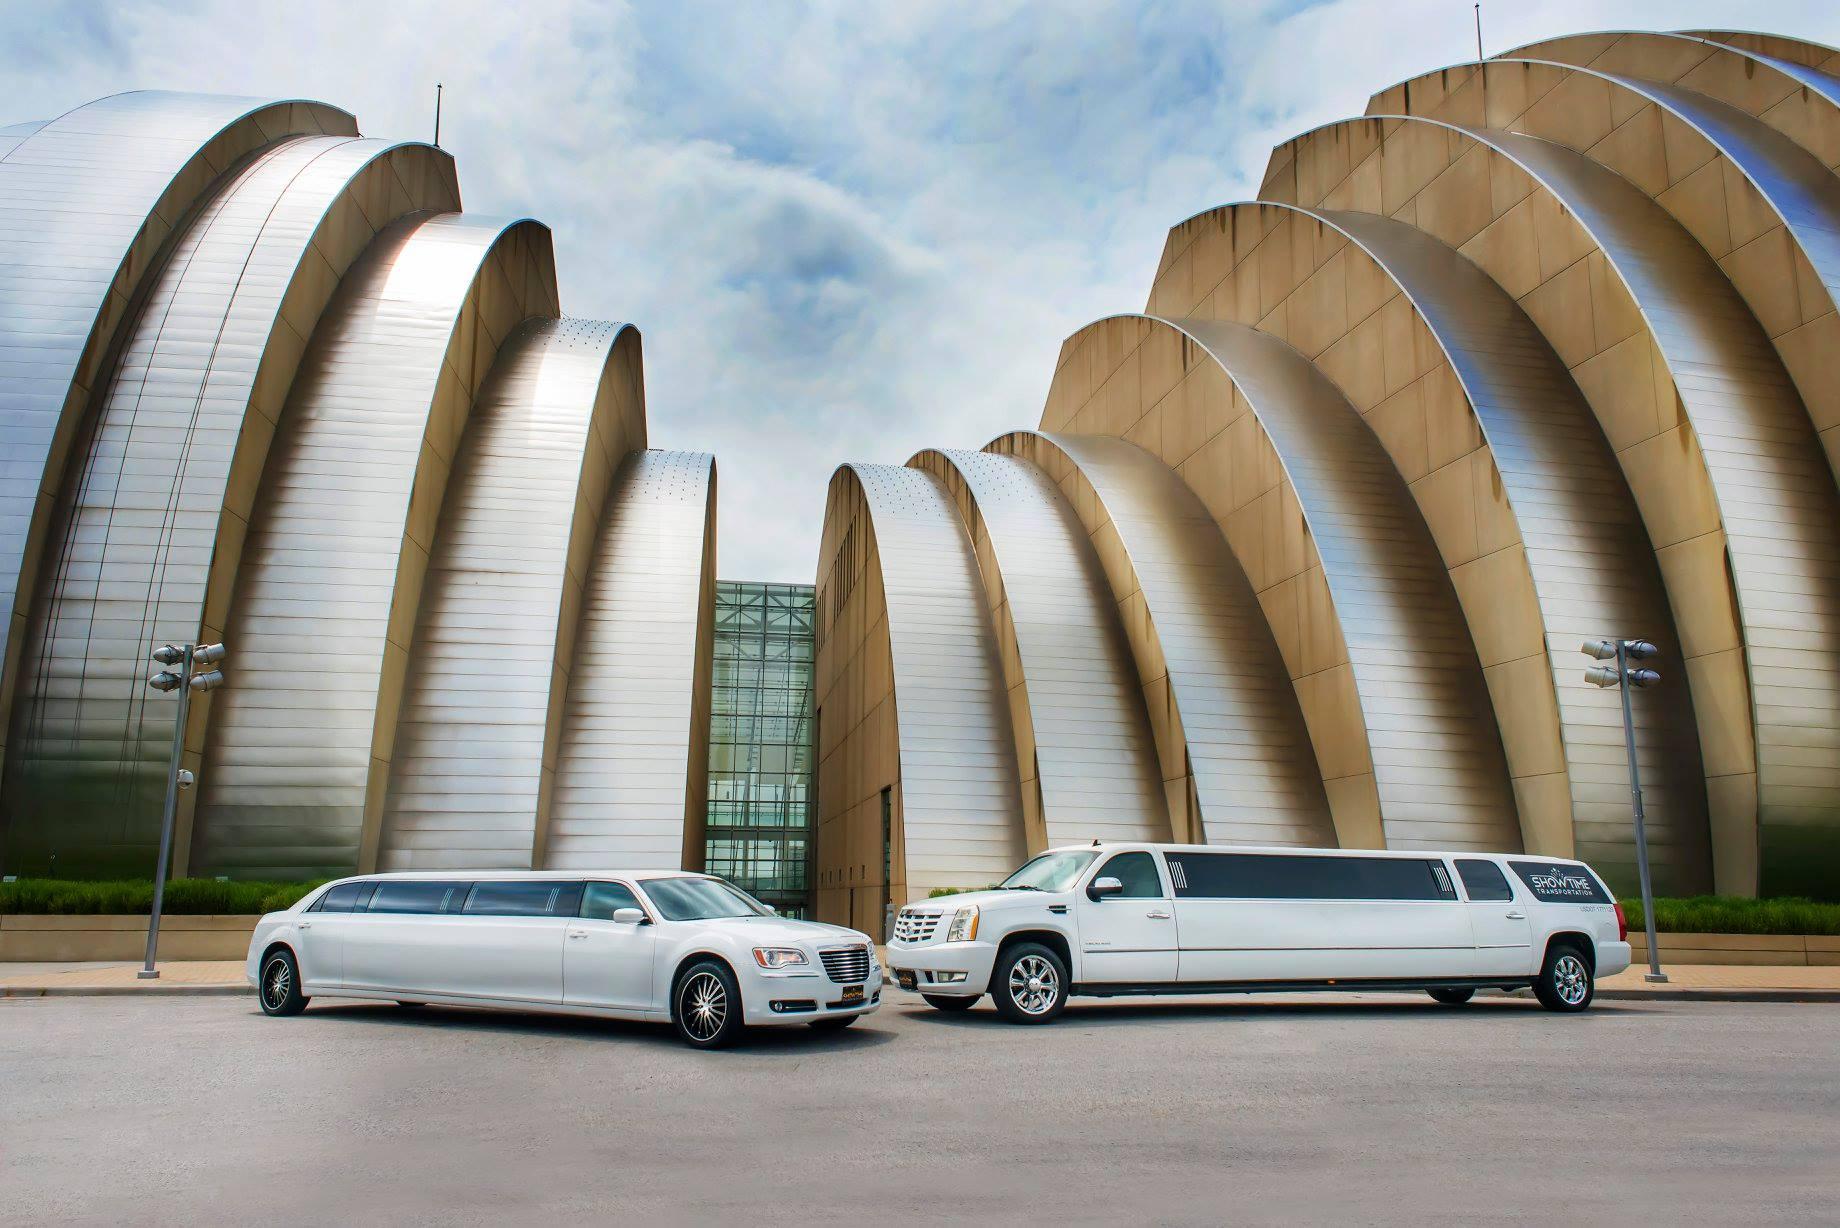 Kansas' Top Rated Local® Limousine Service Award Winner: Showtime Transportation